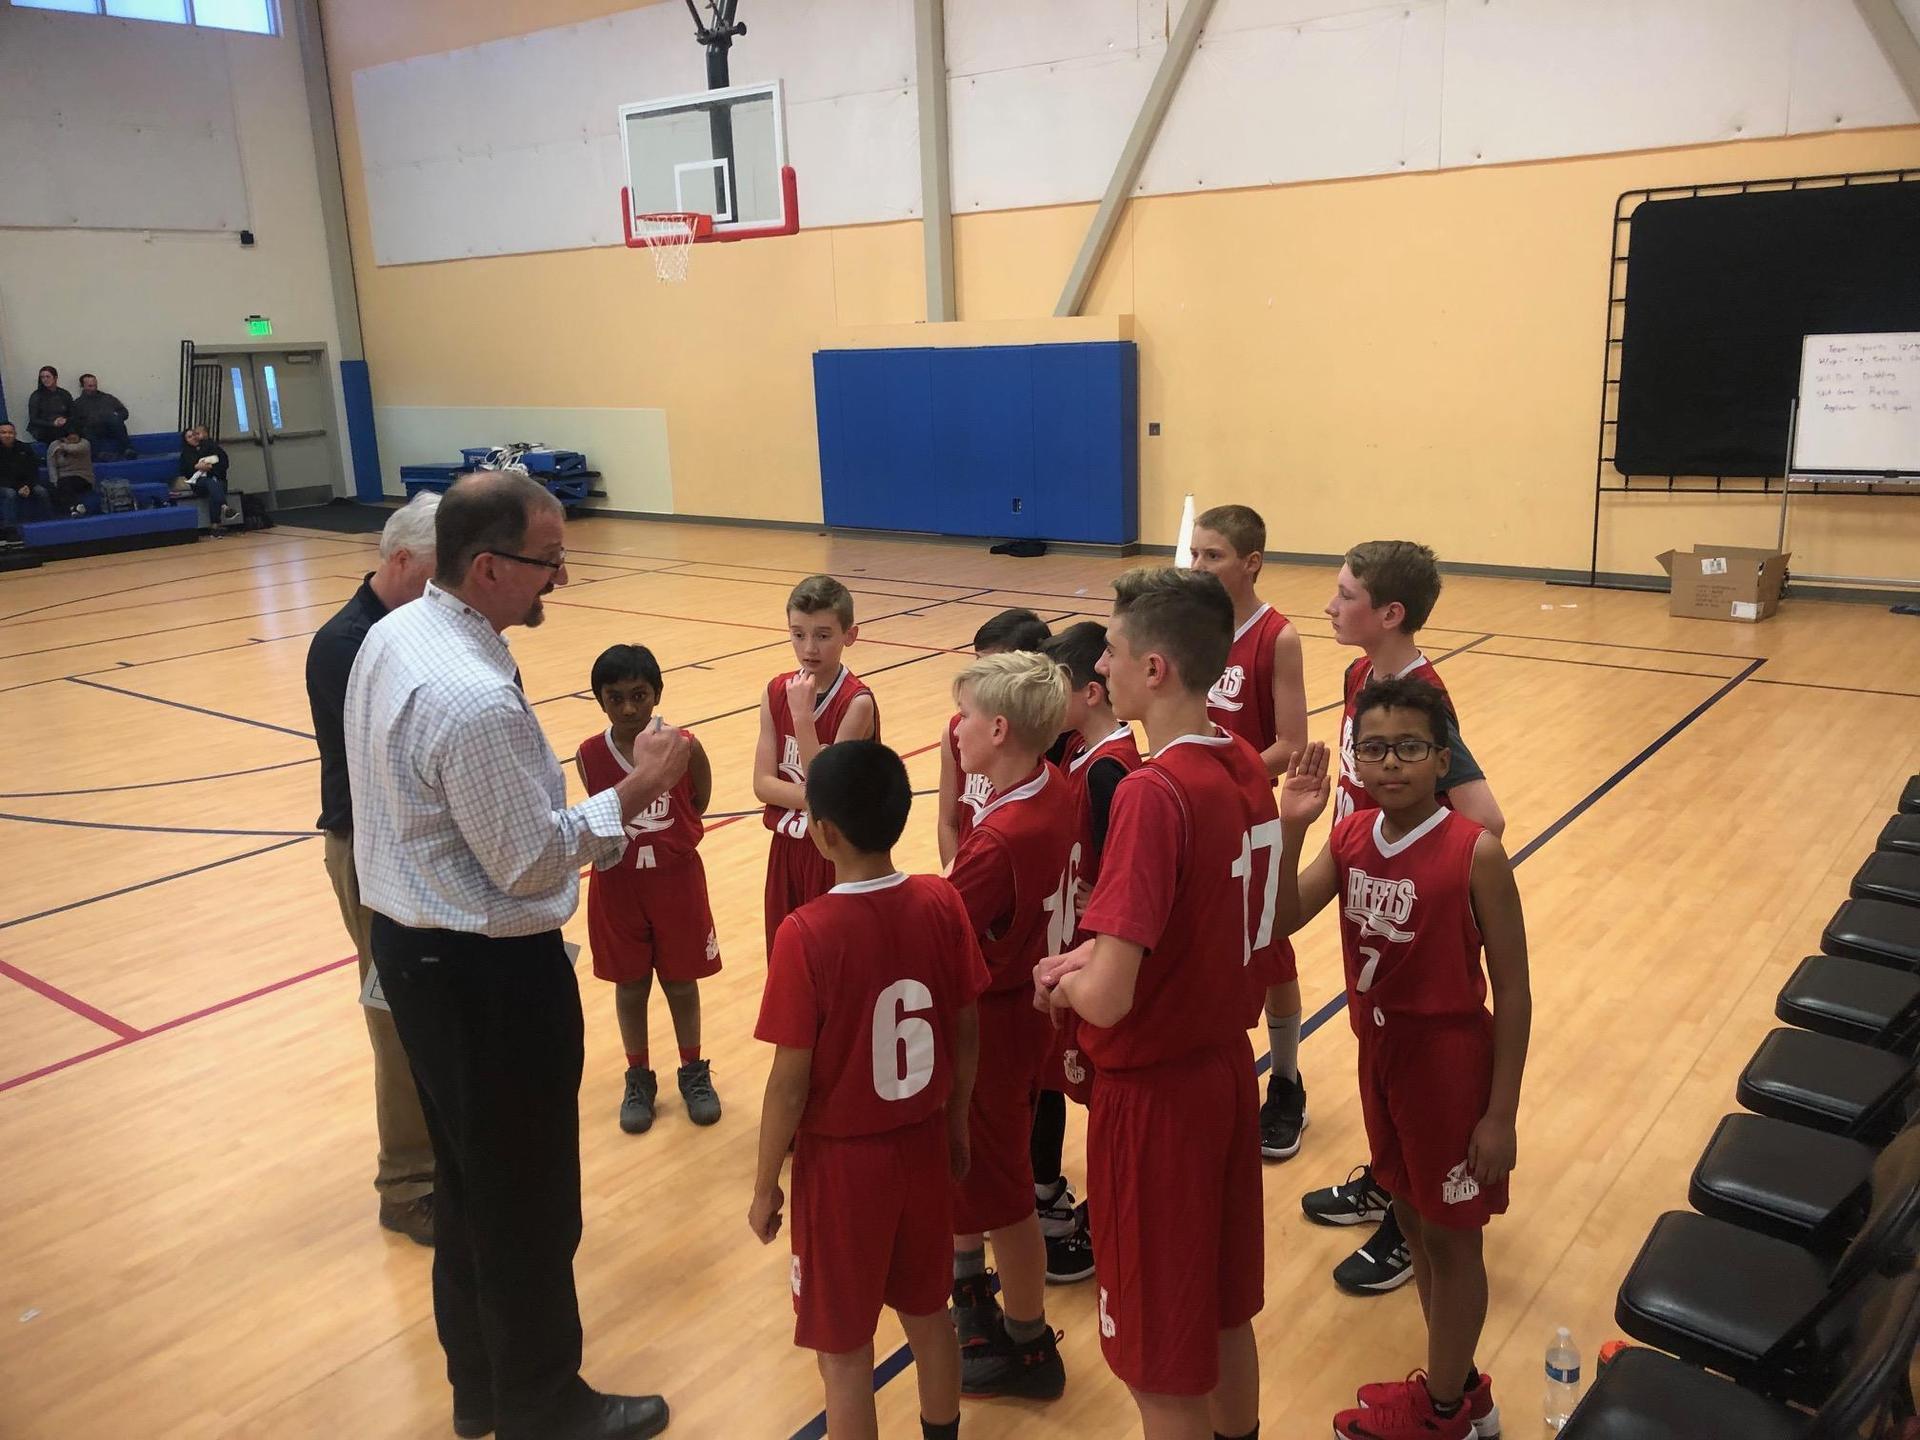 Lincoln Meadows boys basketball huddle with coach